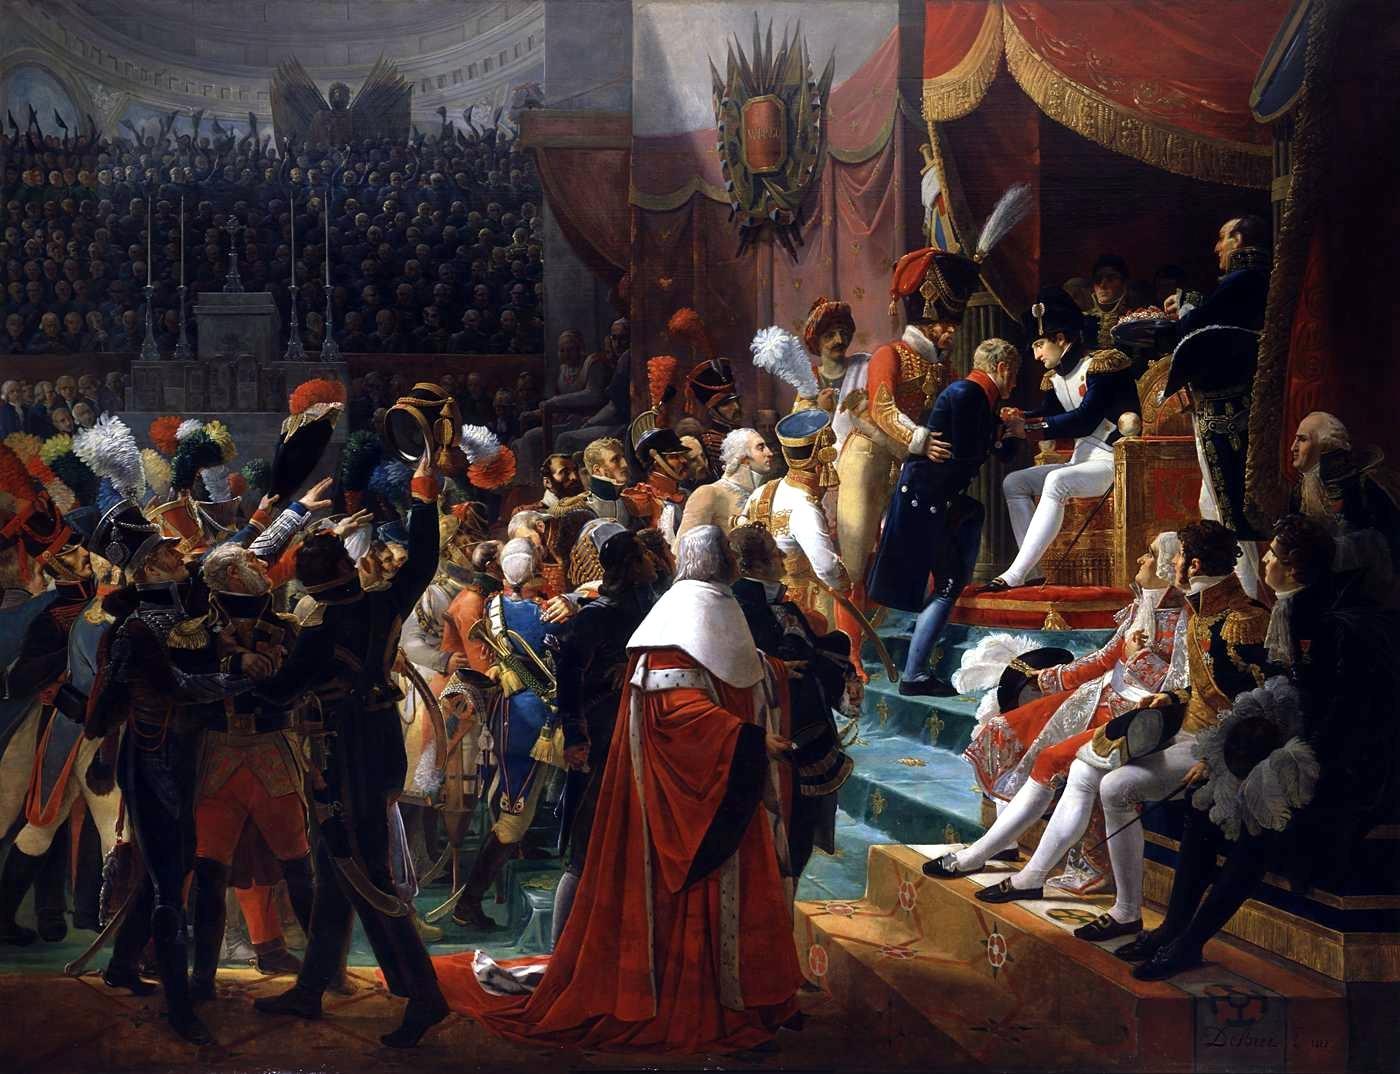 First remittance of the Légion d'Honneur, 15 July 1804, at Saint-Louis des Invalides, by Jean-Baptiste Debret (1812).